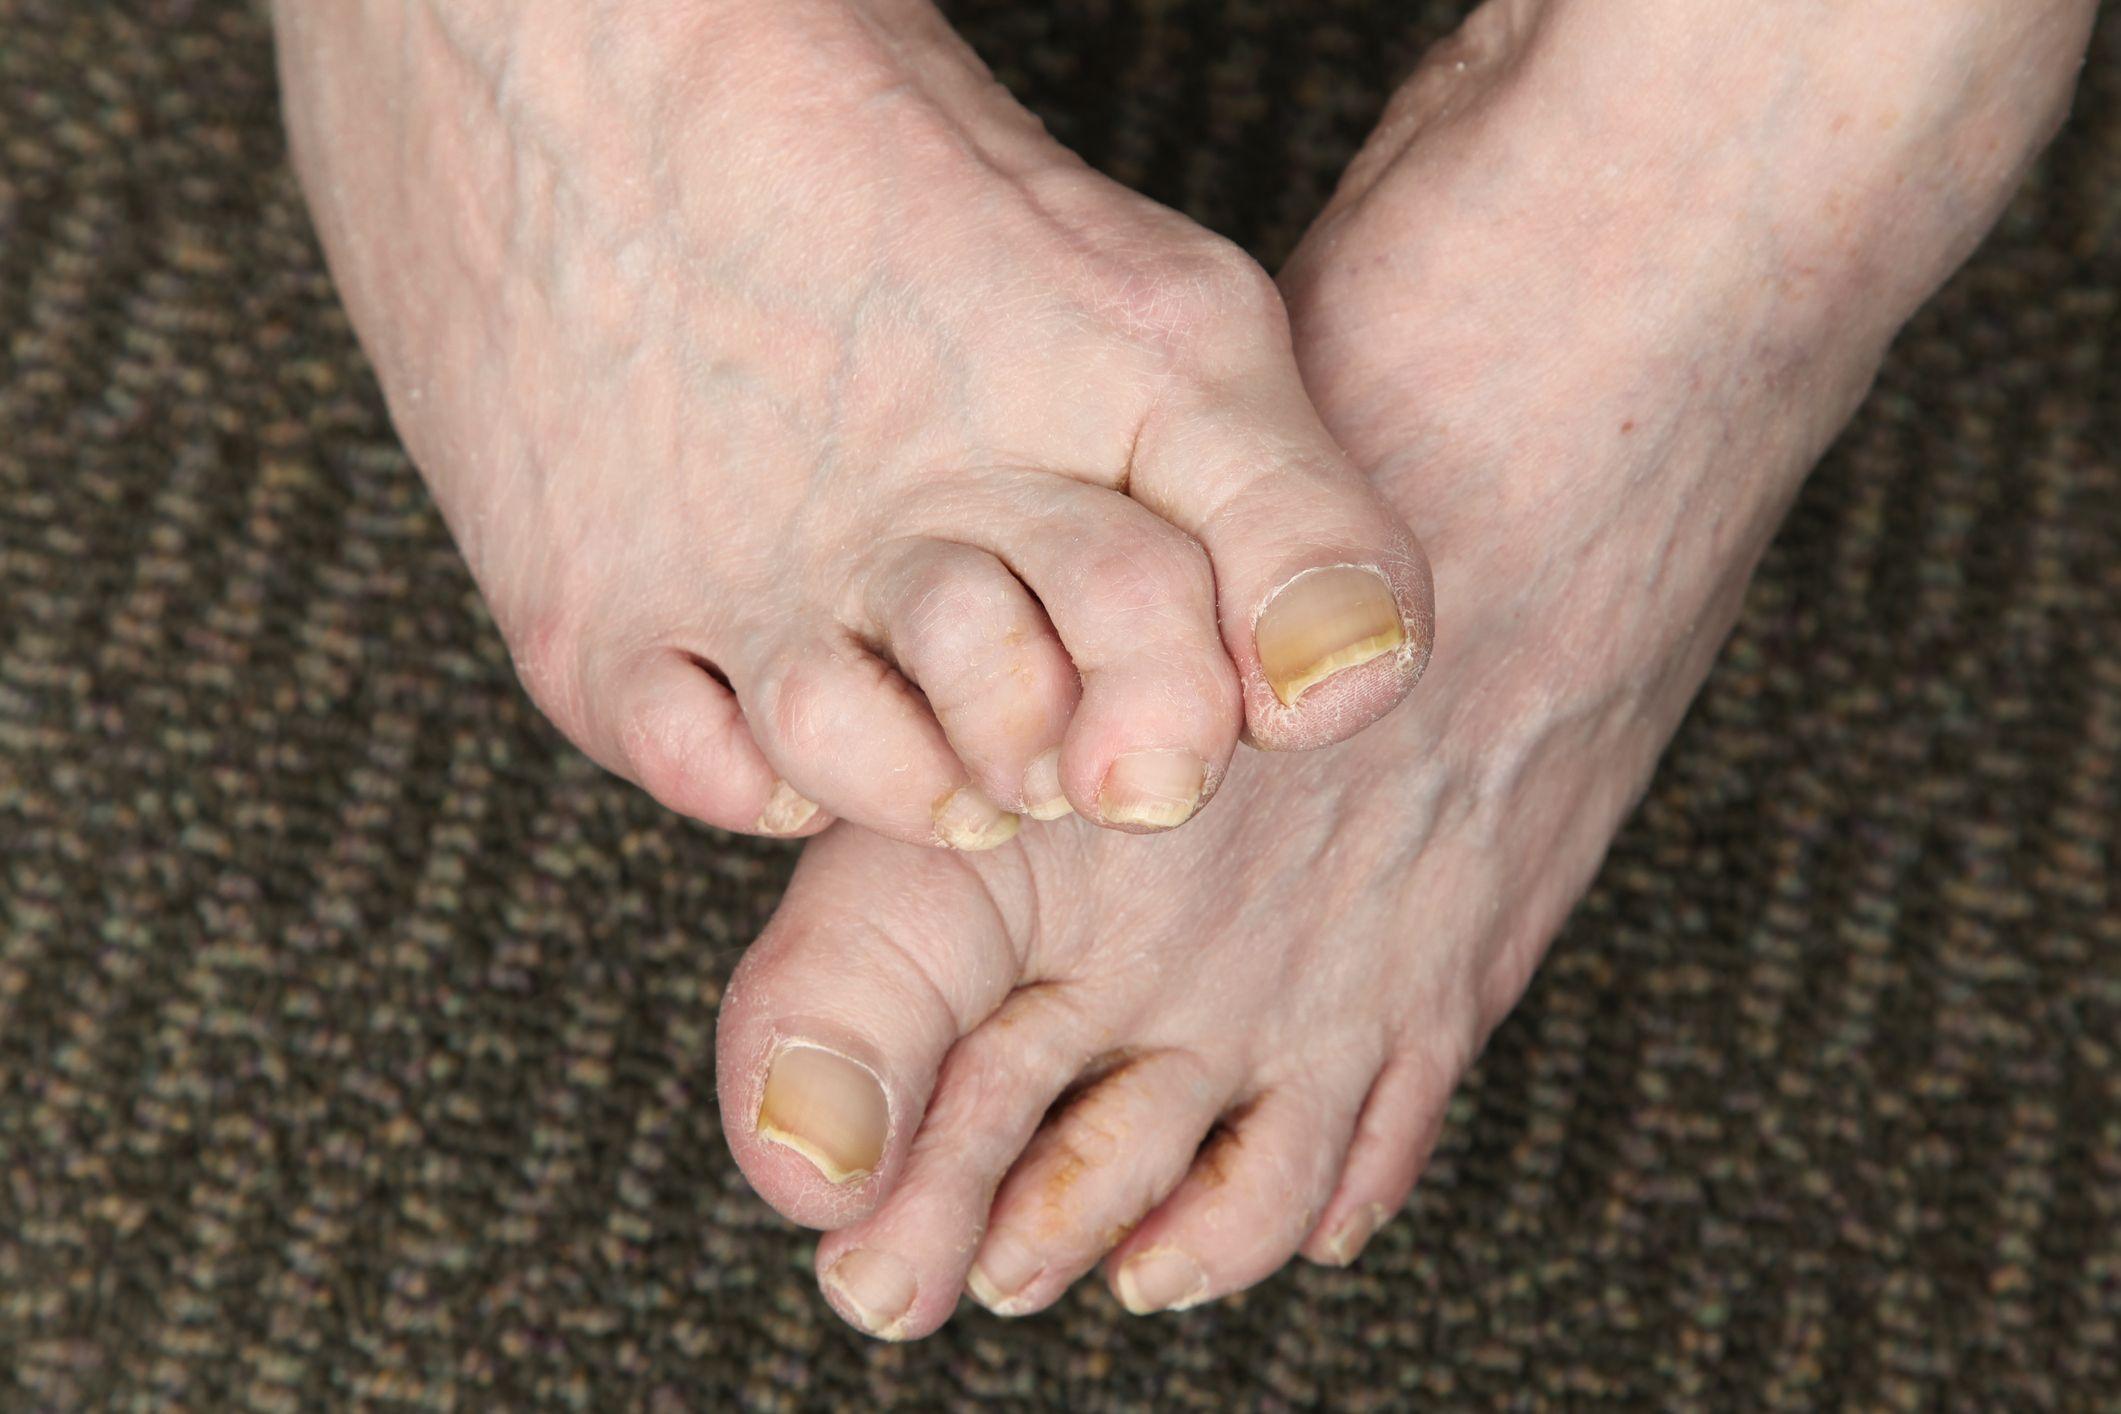 toes curling downward